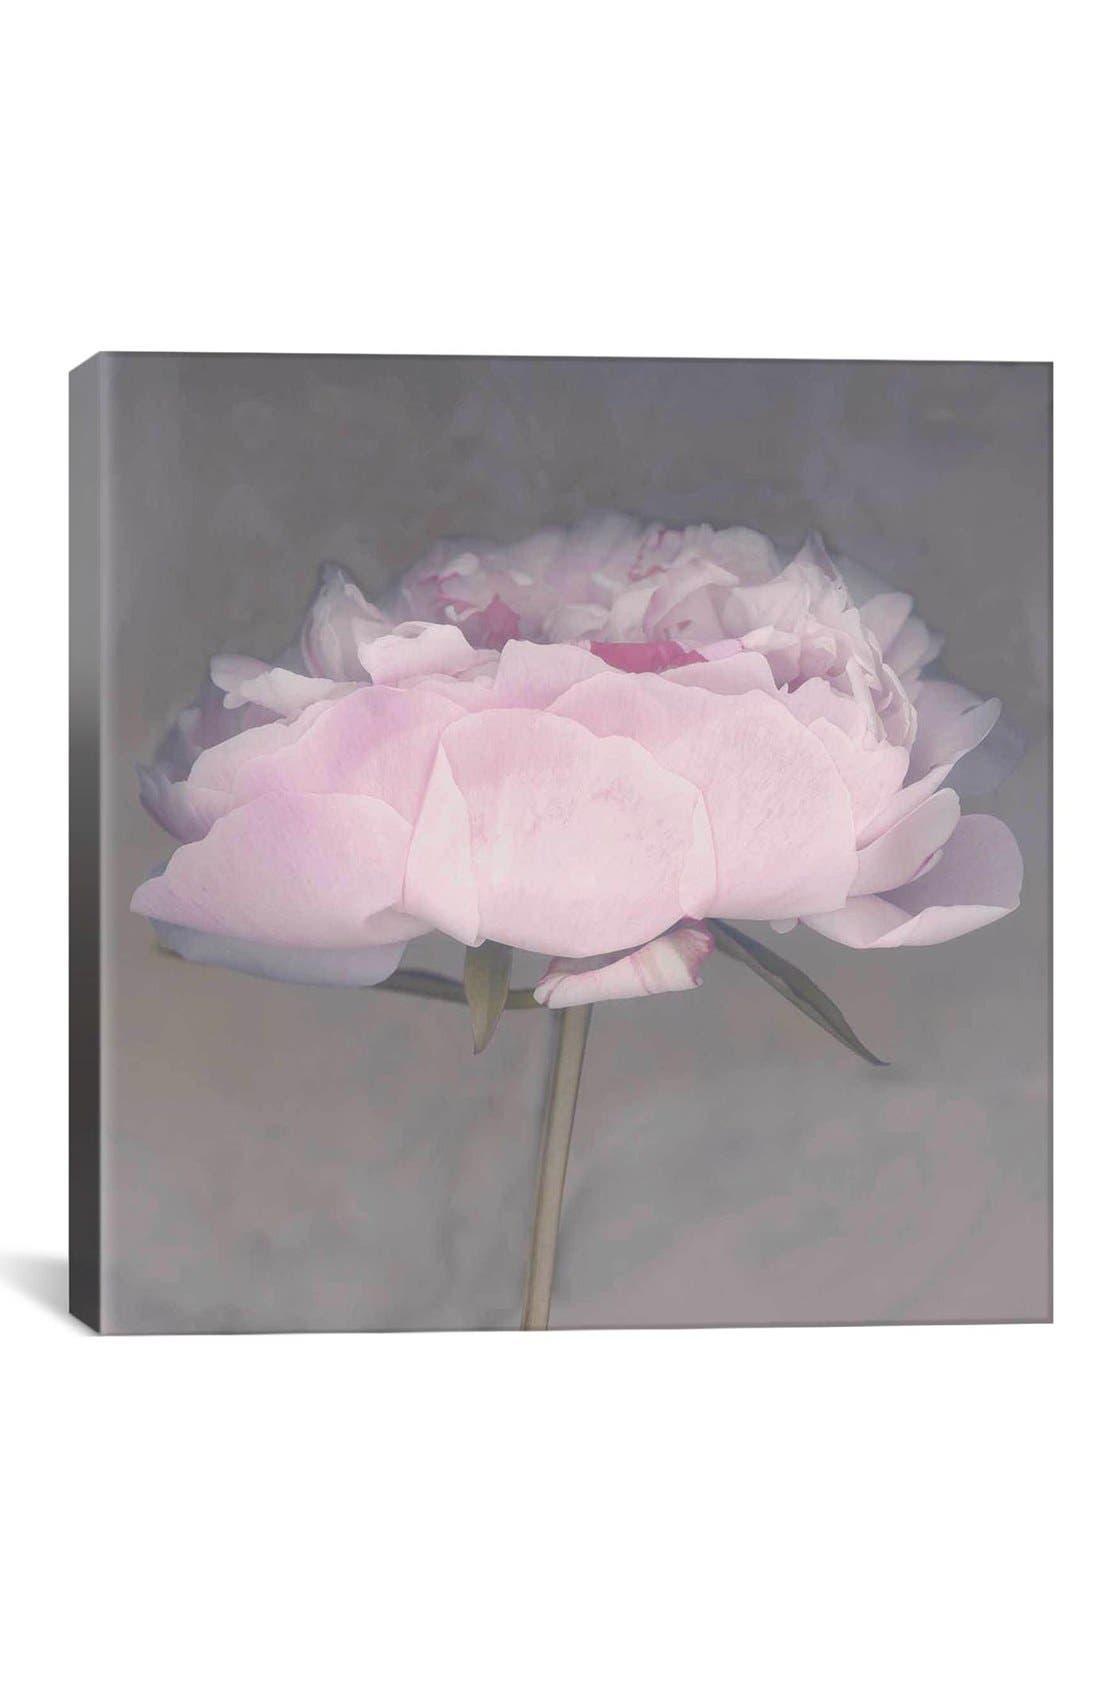 Main Image - iCanvas 'Jolie - Erin Clark' Giclée Print Canvas Art